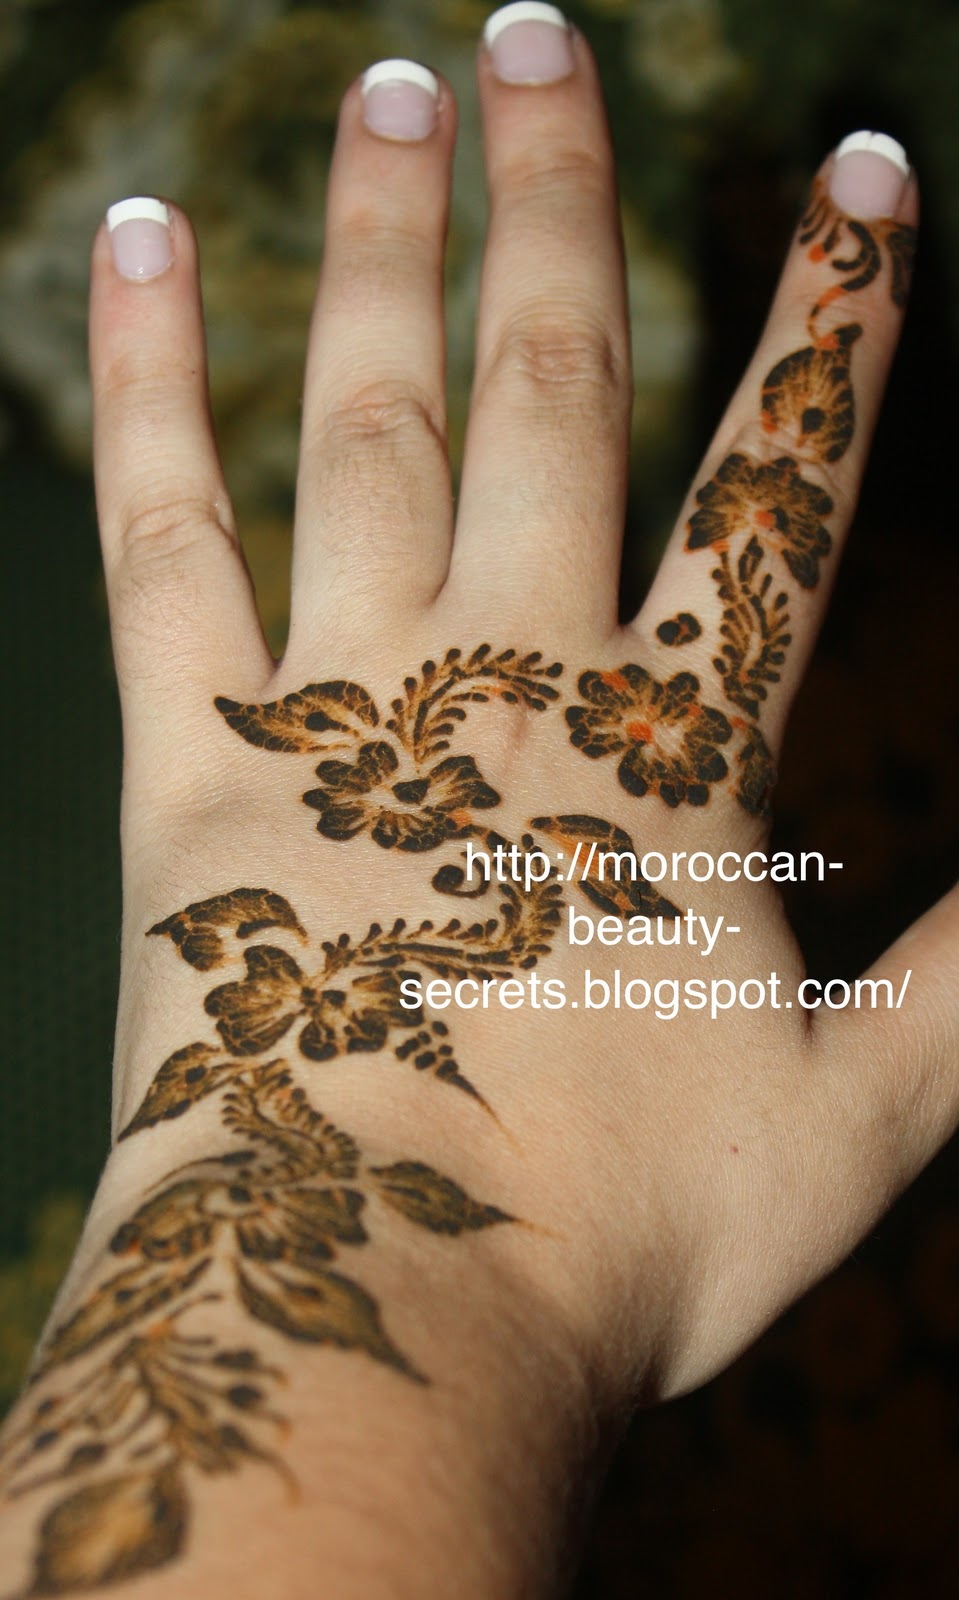 Khaleeji Henna Mehndi Design : Moroccan beauty secrets henna khaleeji